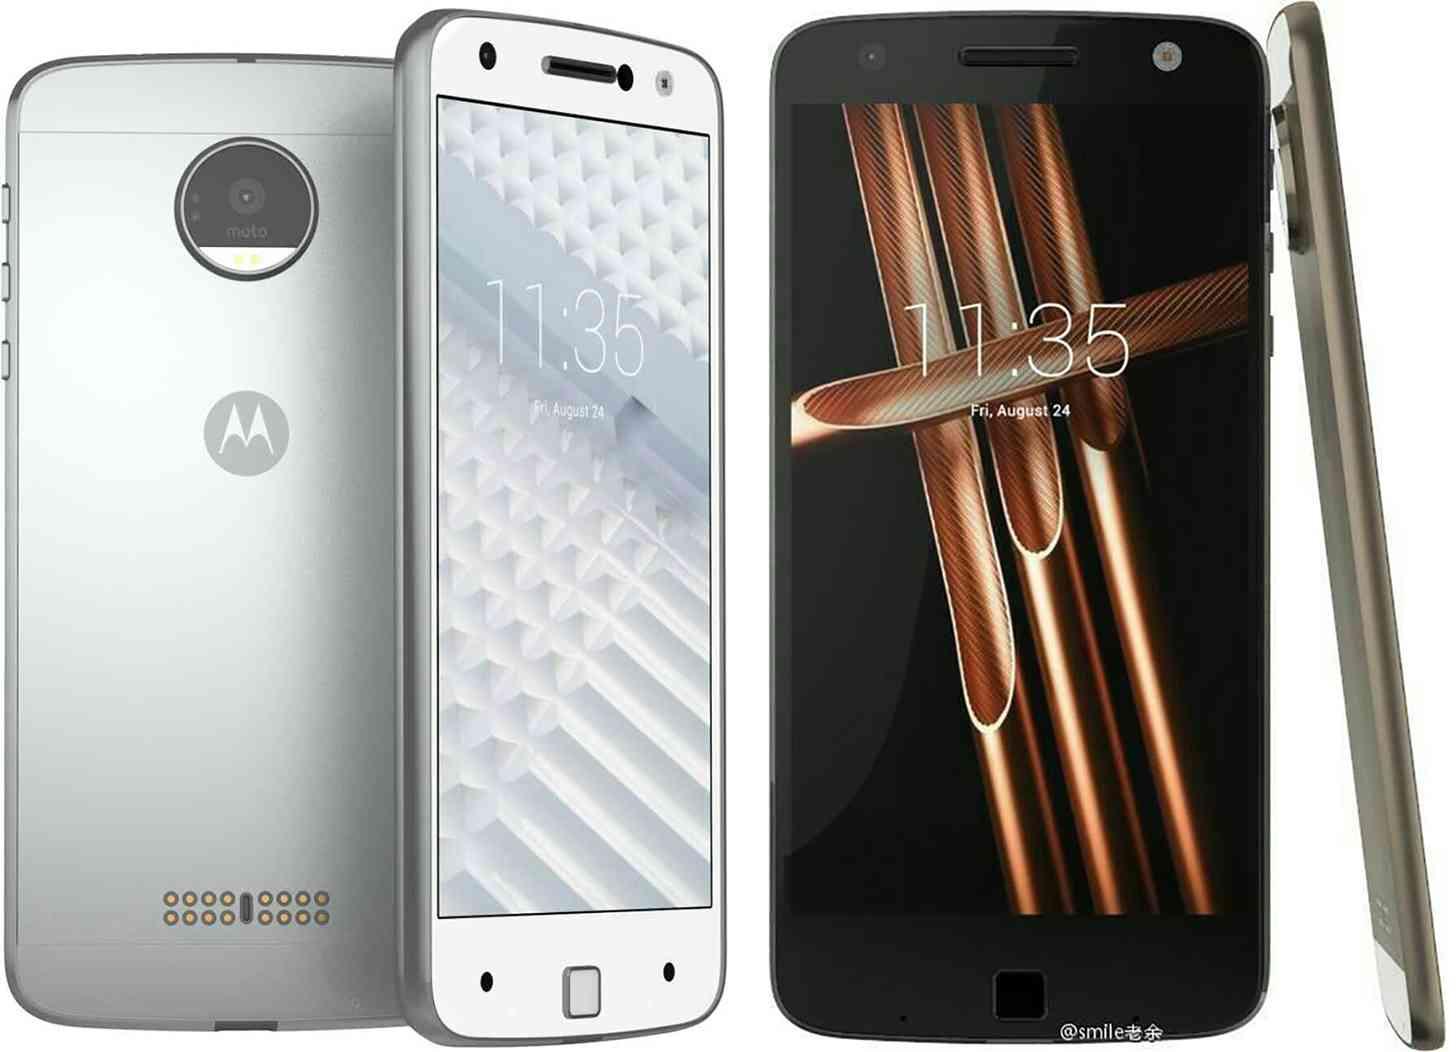 Moto Z phones leak